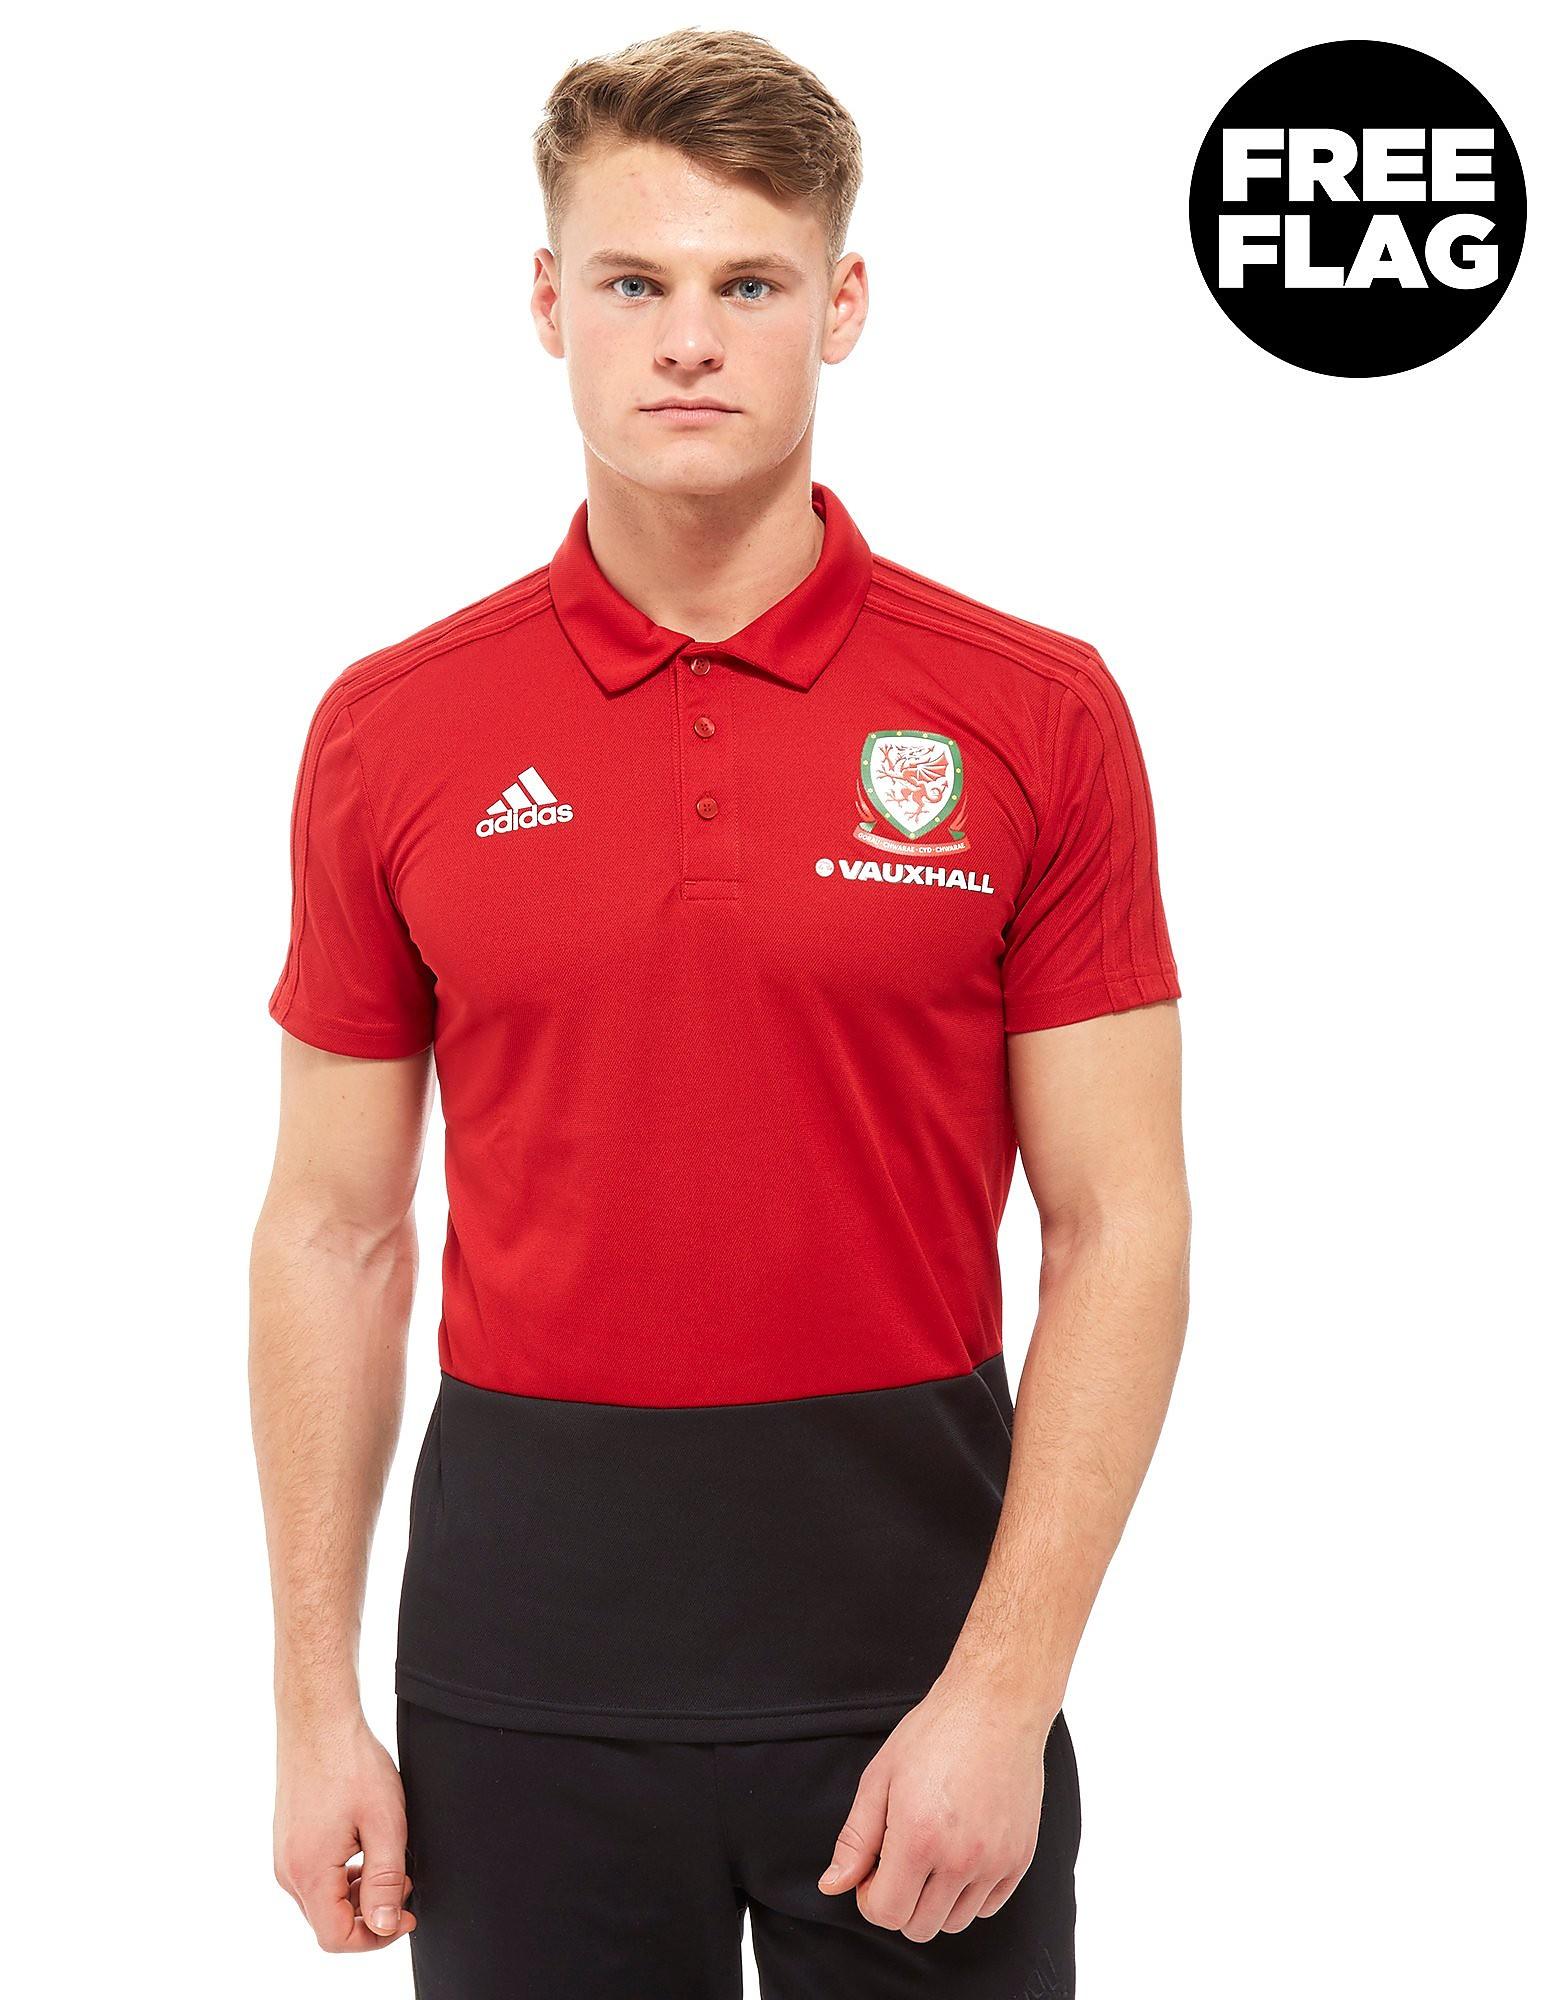 adidas FA Wales 2018 Polo Shirt